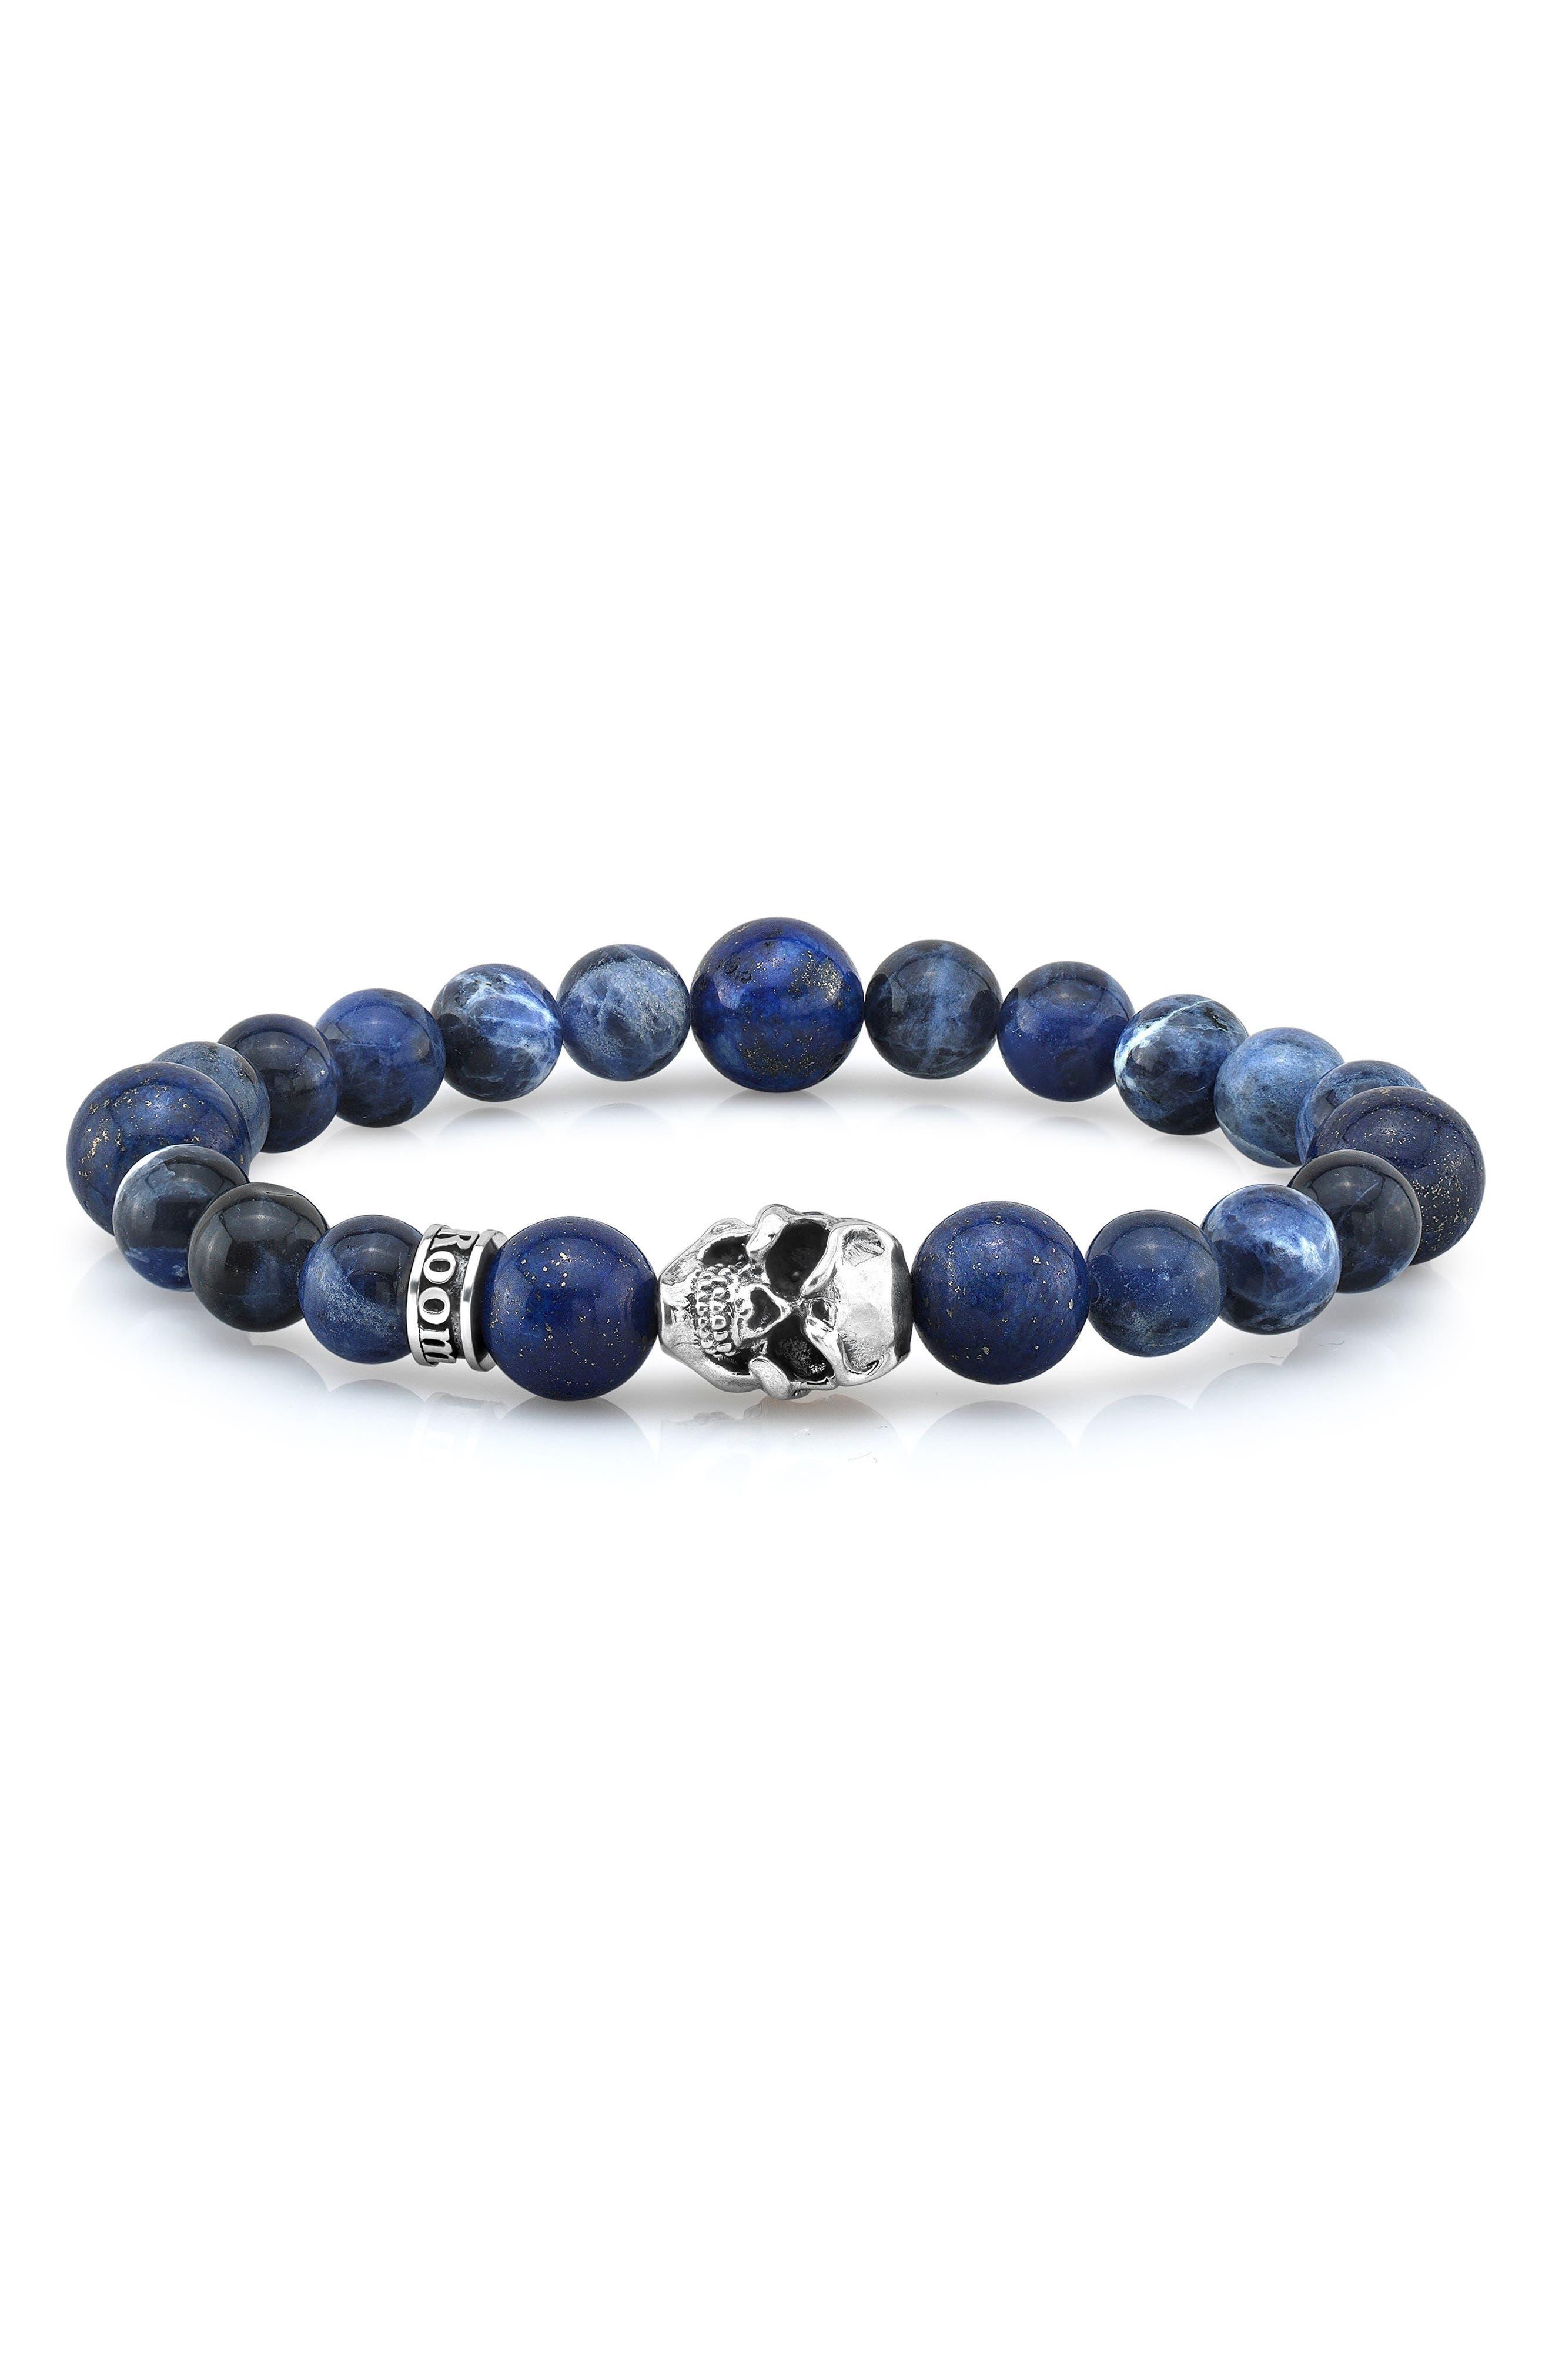 Room101 Sodalite & Lapis Lazuli Bead Bracelet